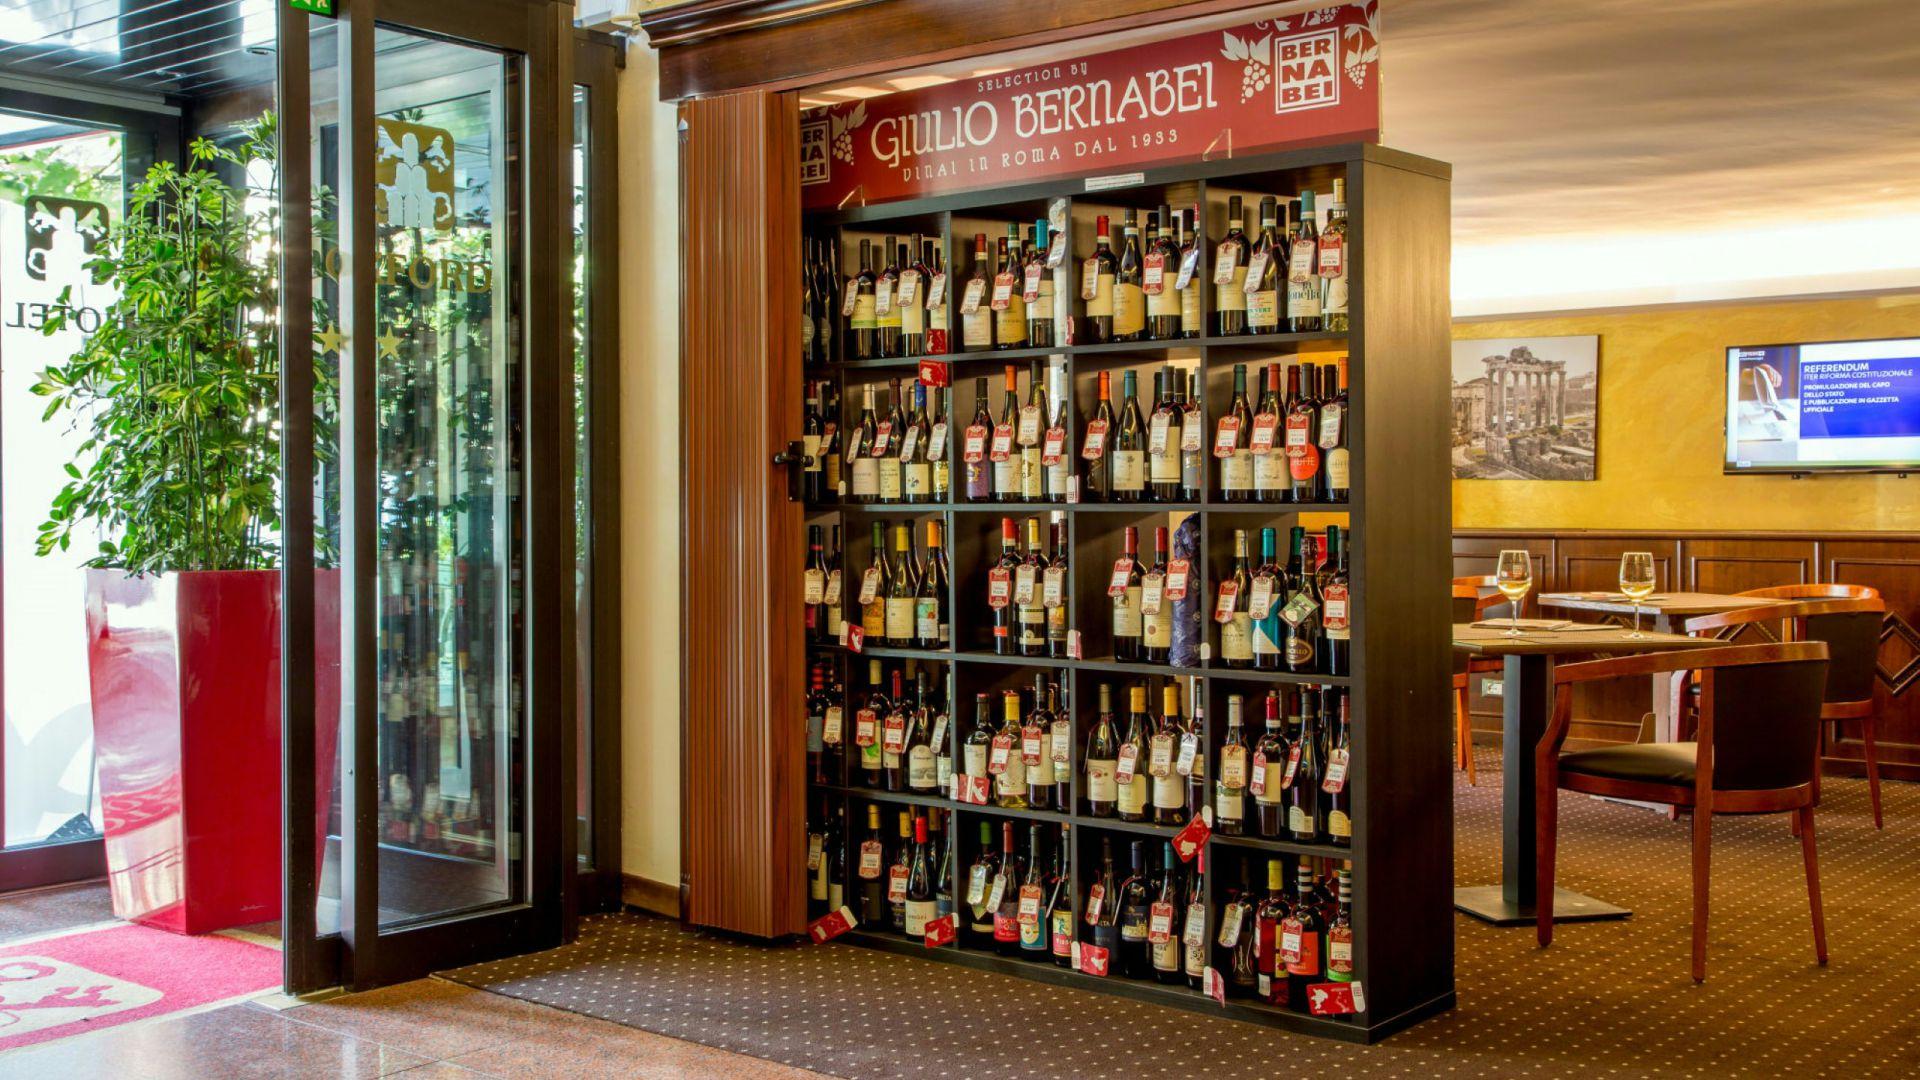 Foto-Hotel-Oxford-Roma-bar-de-vinhos-13